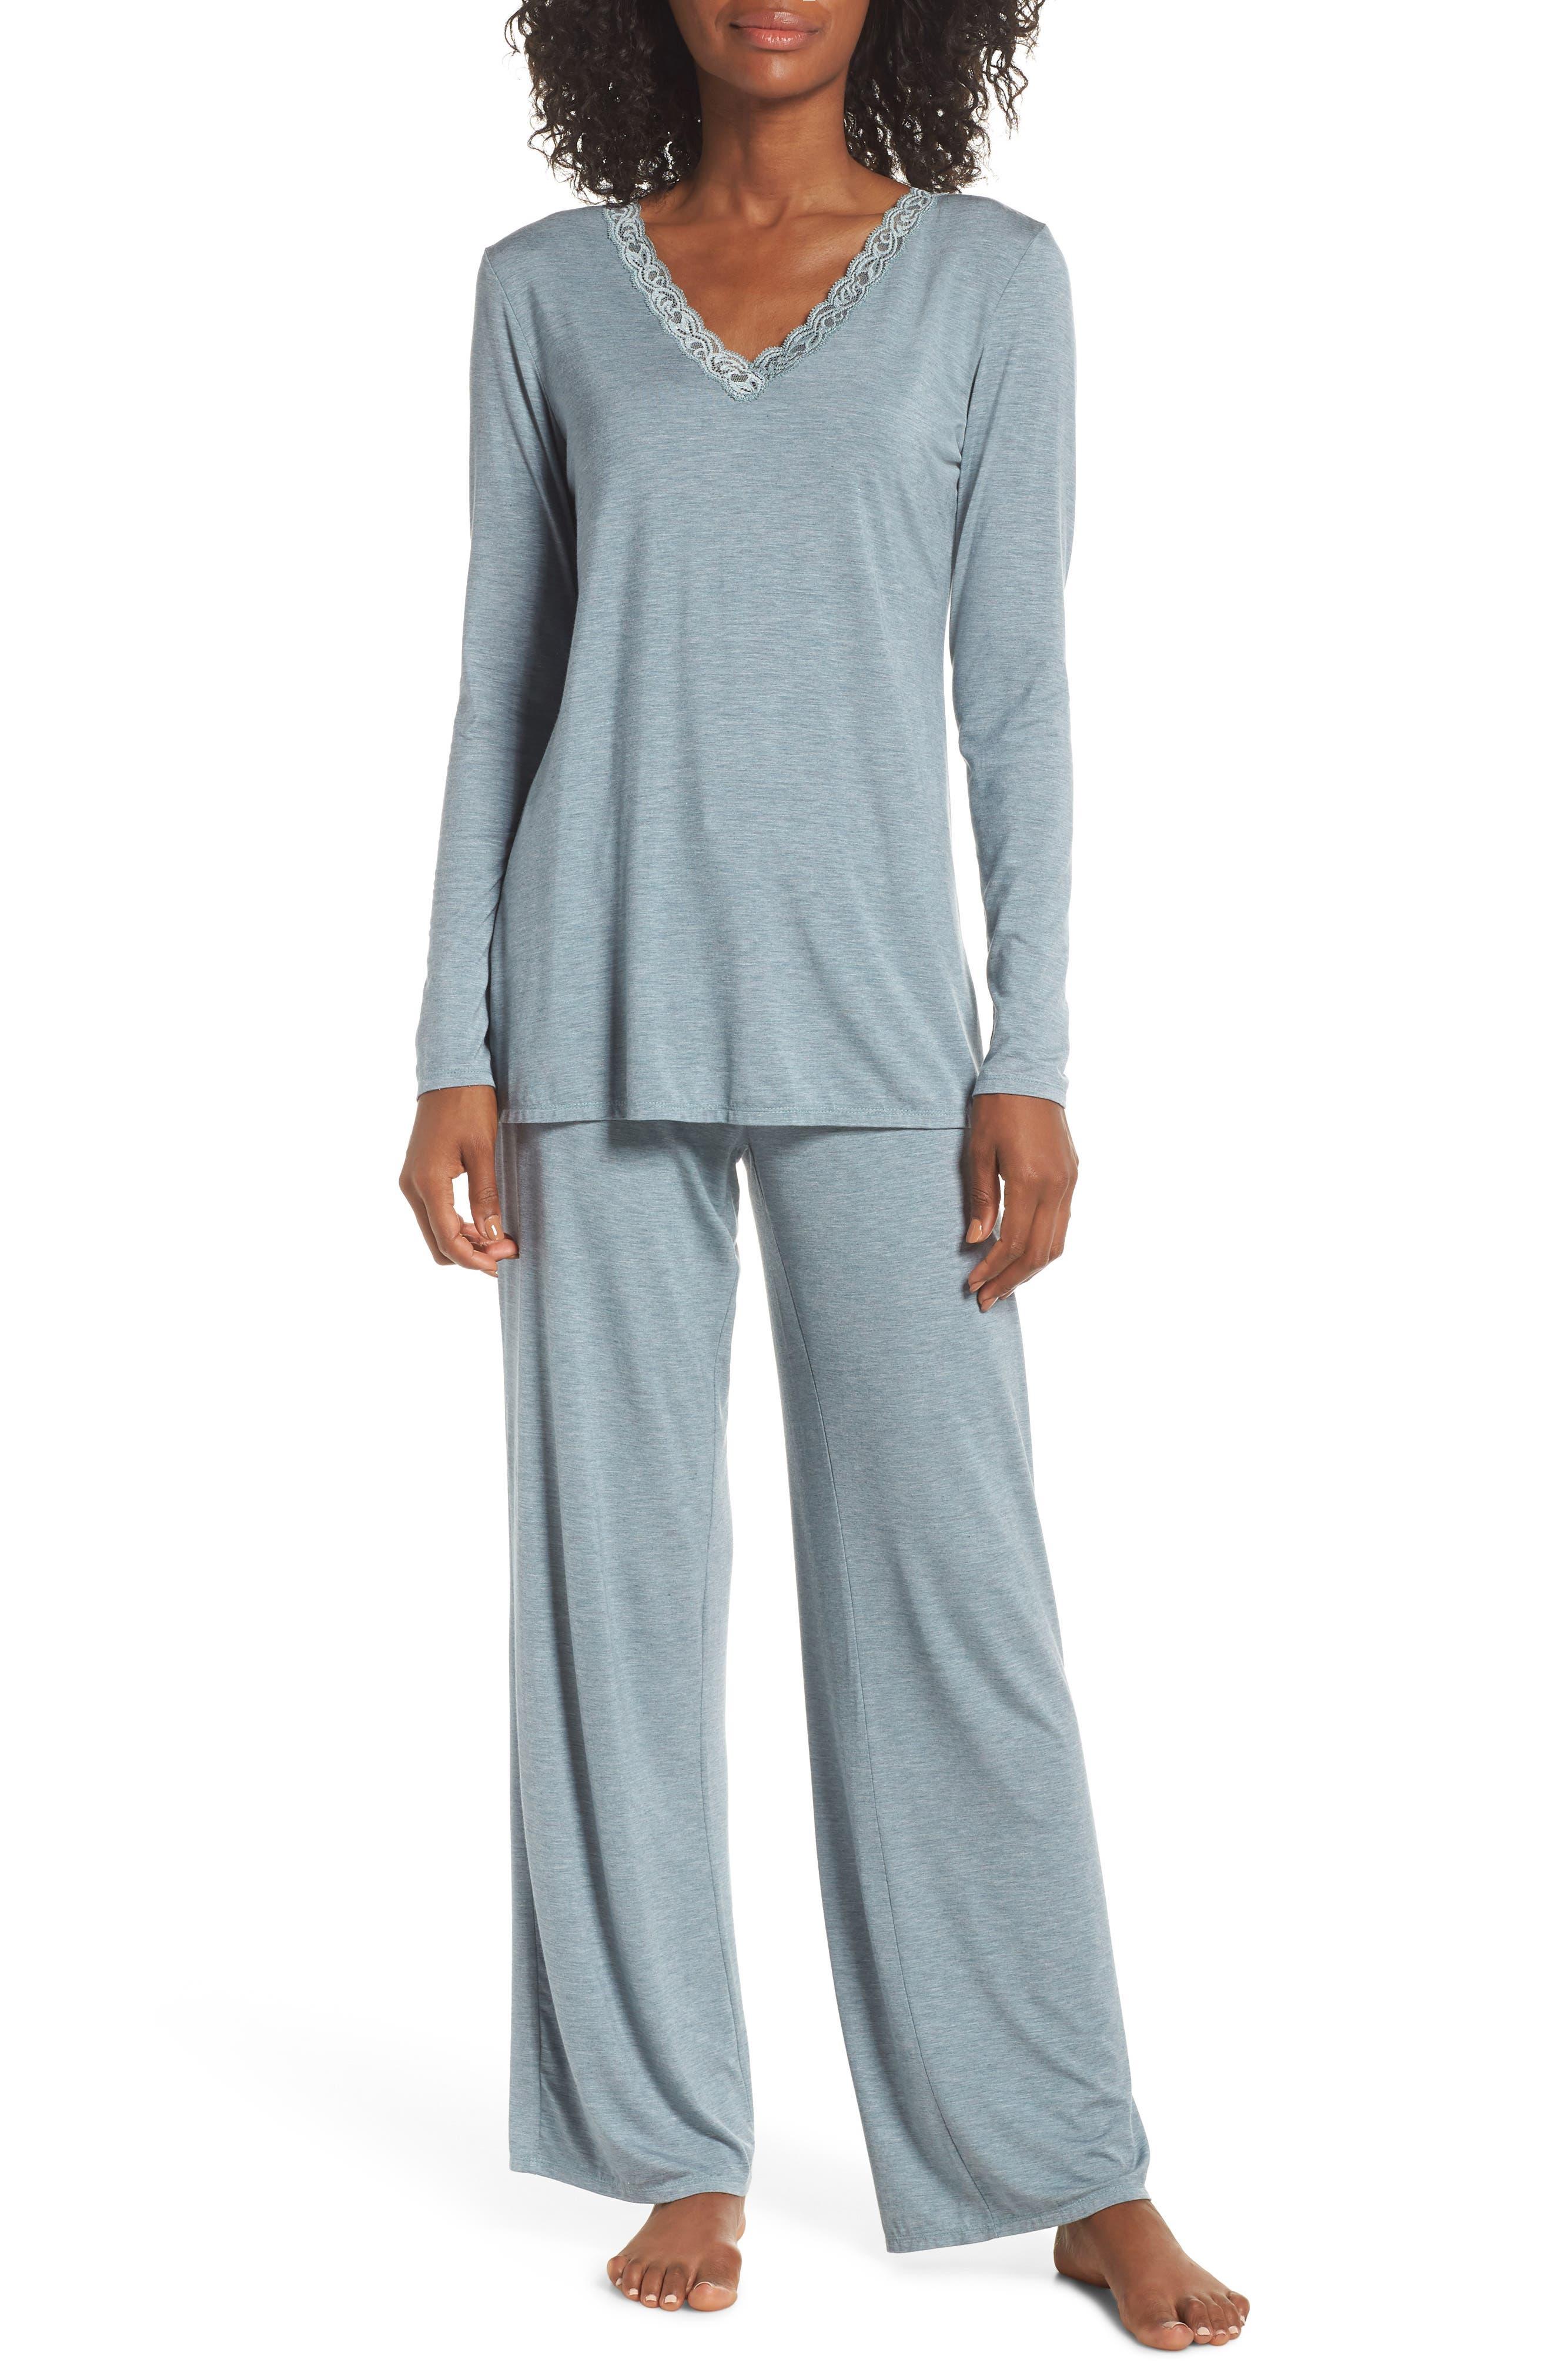 NATORI, Feathers Pajamas, Main thumbnail 1, color, 443